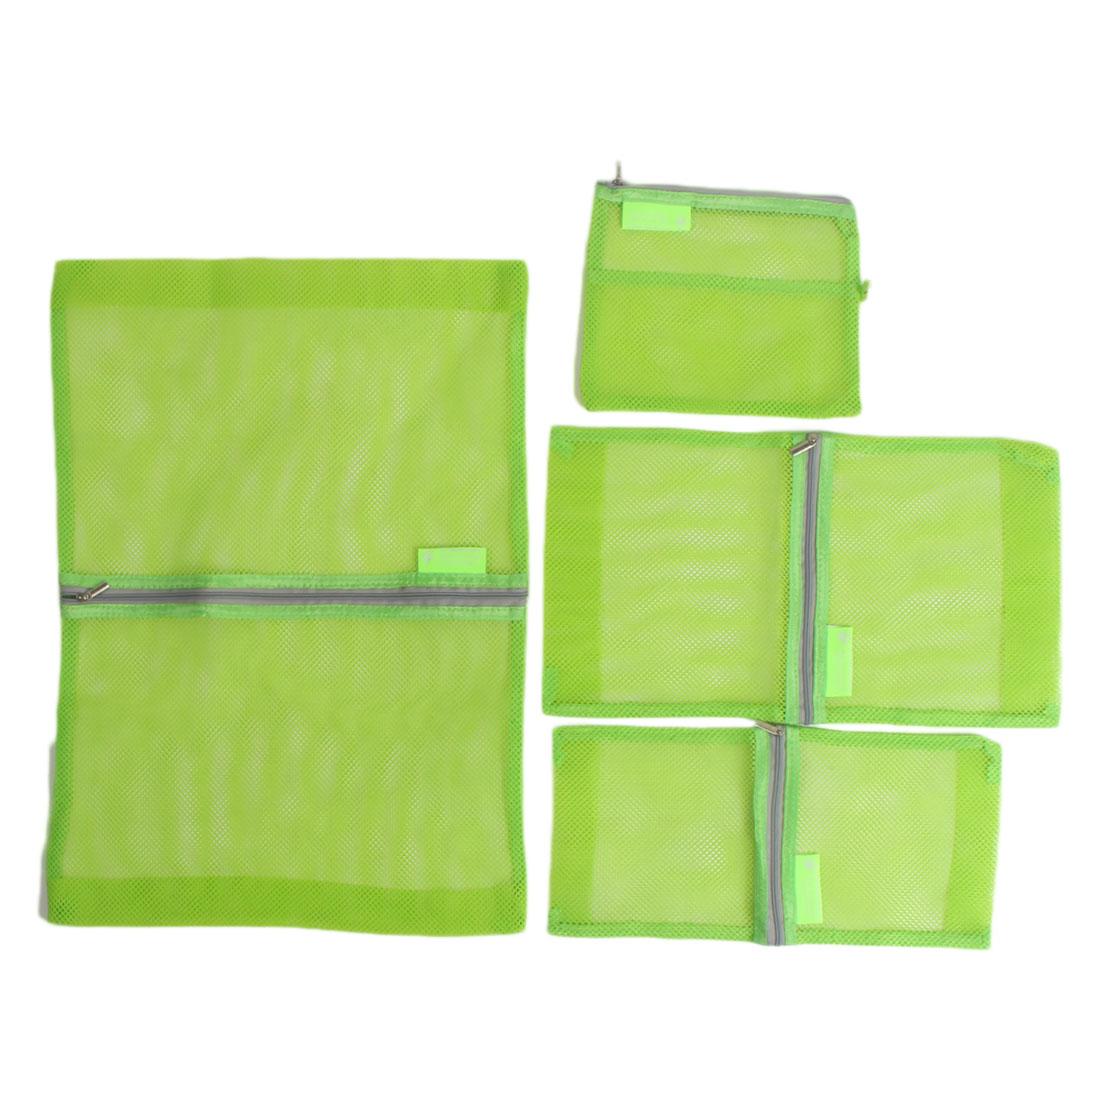 4 in 1 Clothes Underwear Storage Mesh Packing Pouch Luggage Organizer Bag Green